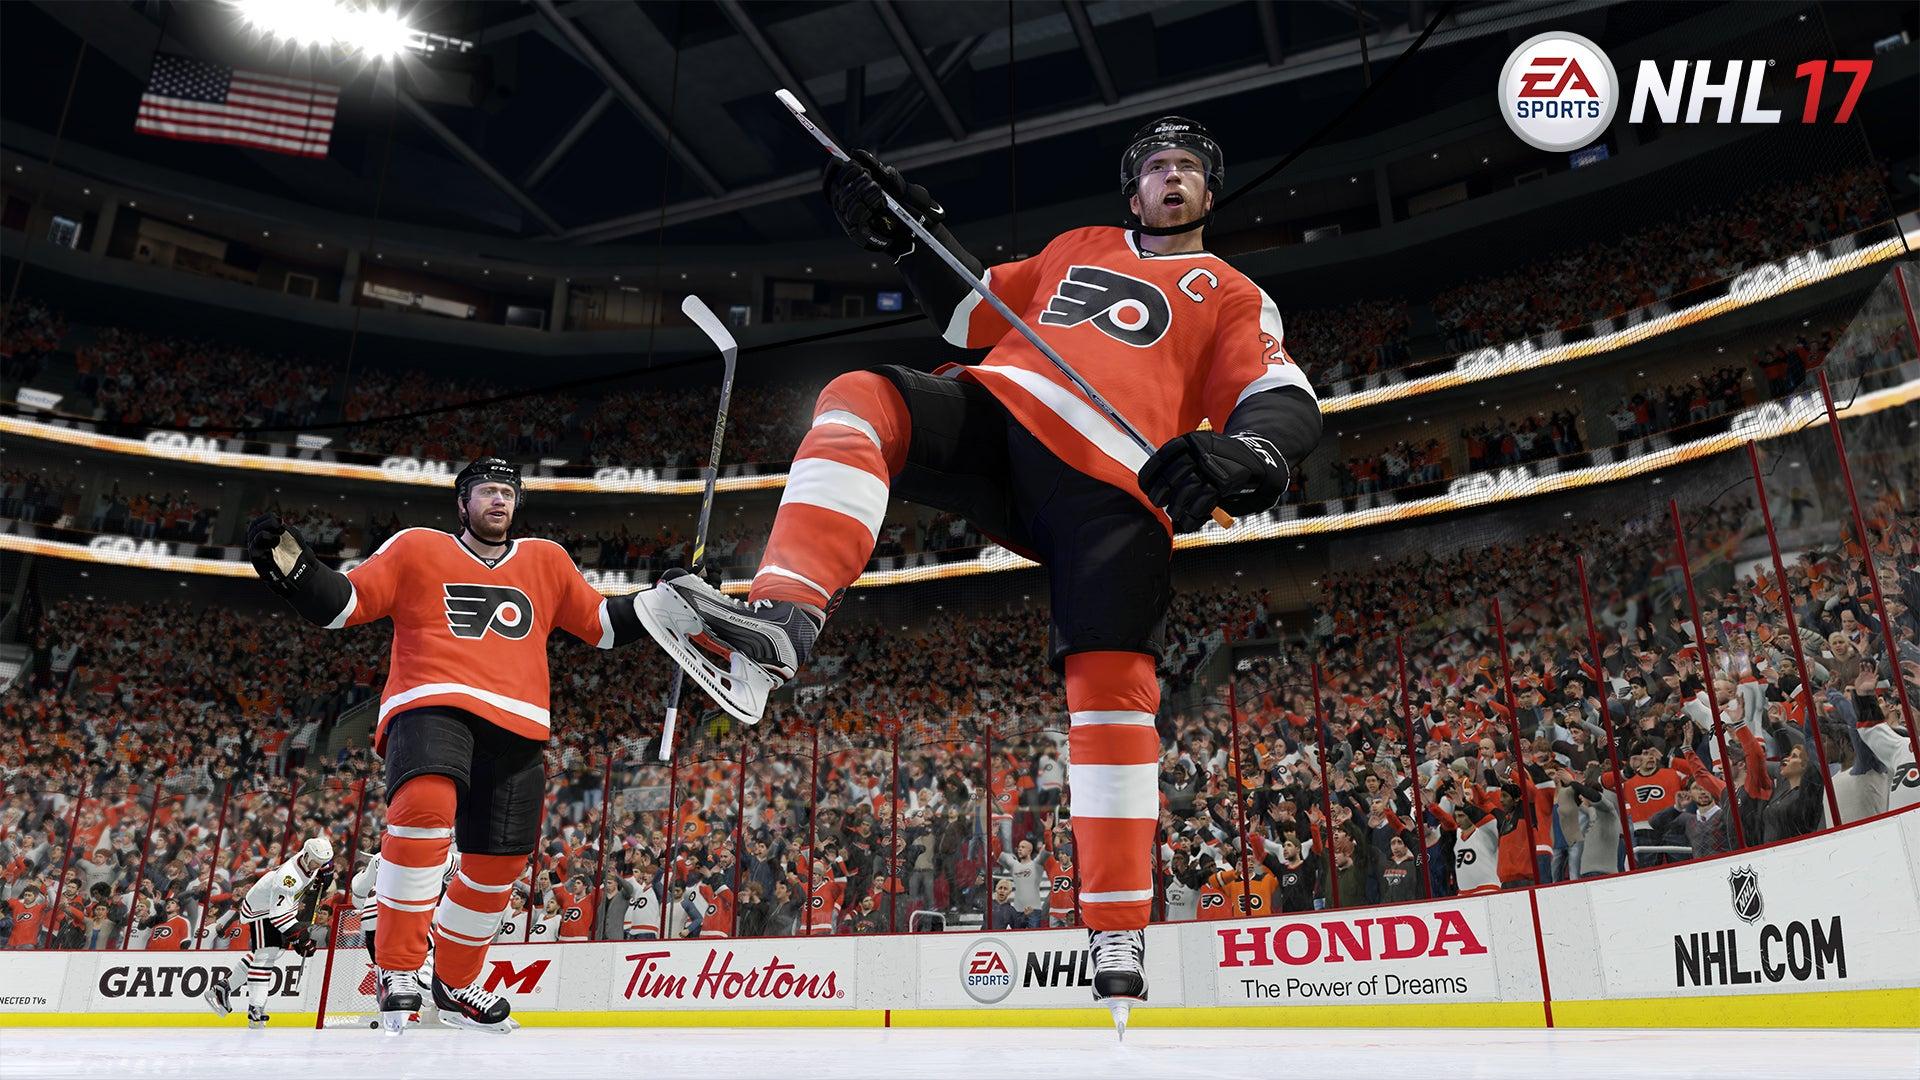 NHL 17 Now Playable On EA Access, Feels A Lot Like NHL 16